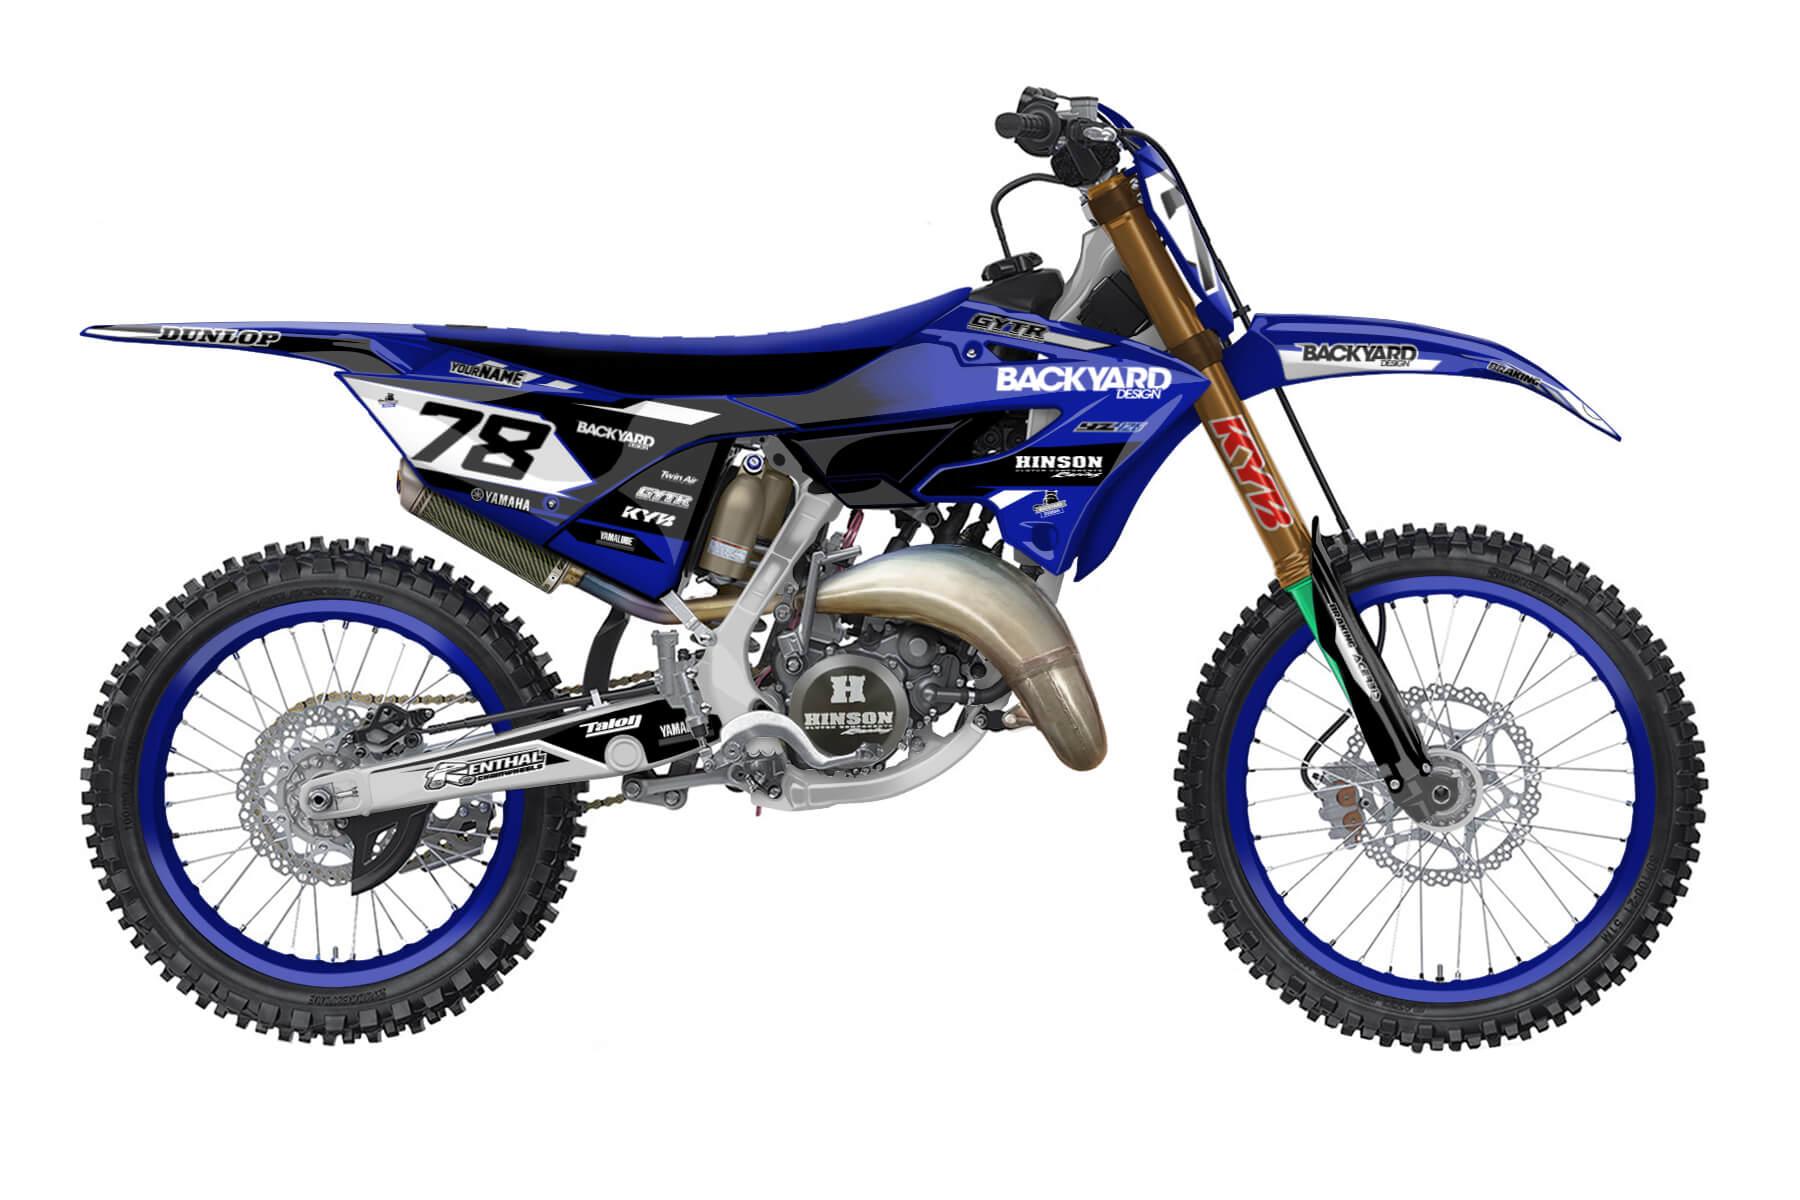 Yamaha YZ 250 - 2022 - Backyard Design - Mx Dekor - Division Basic